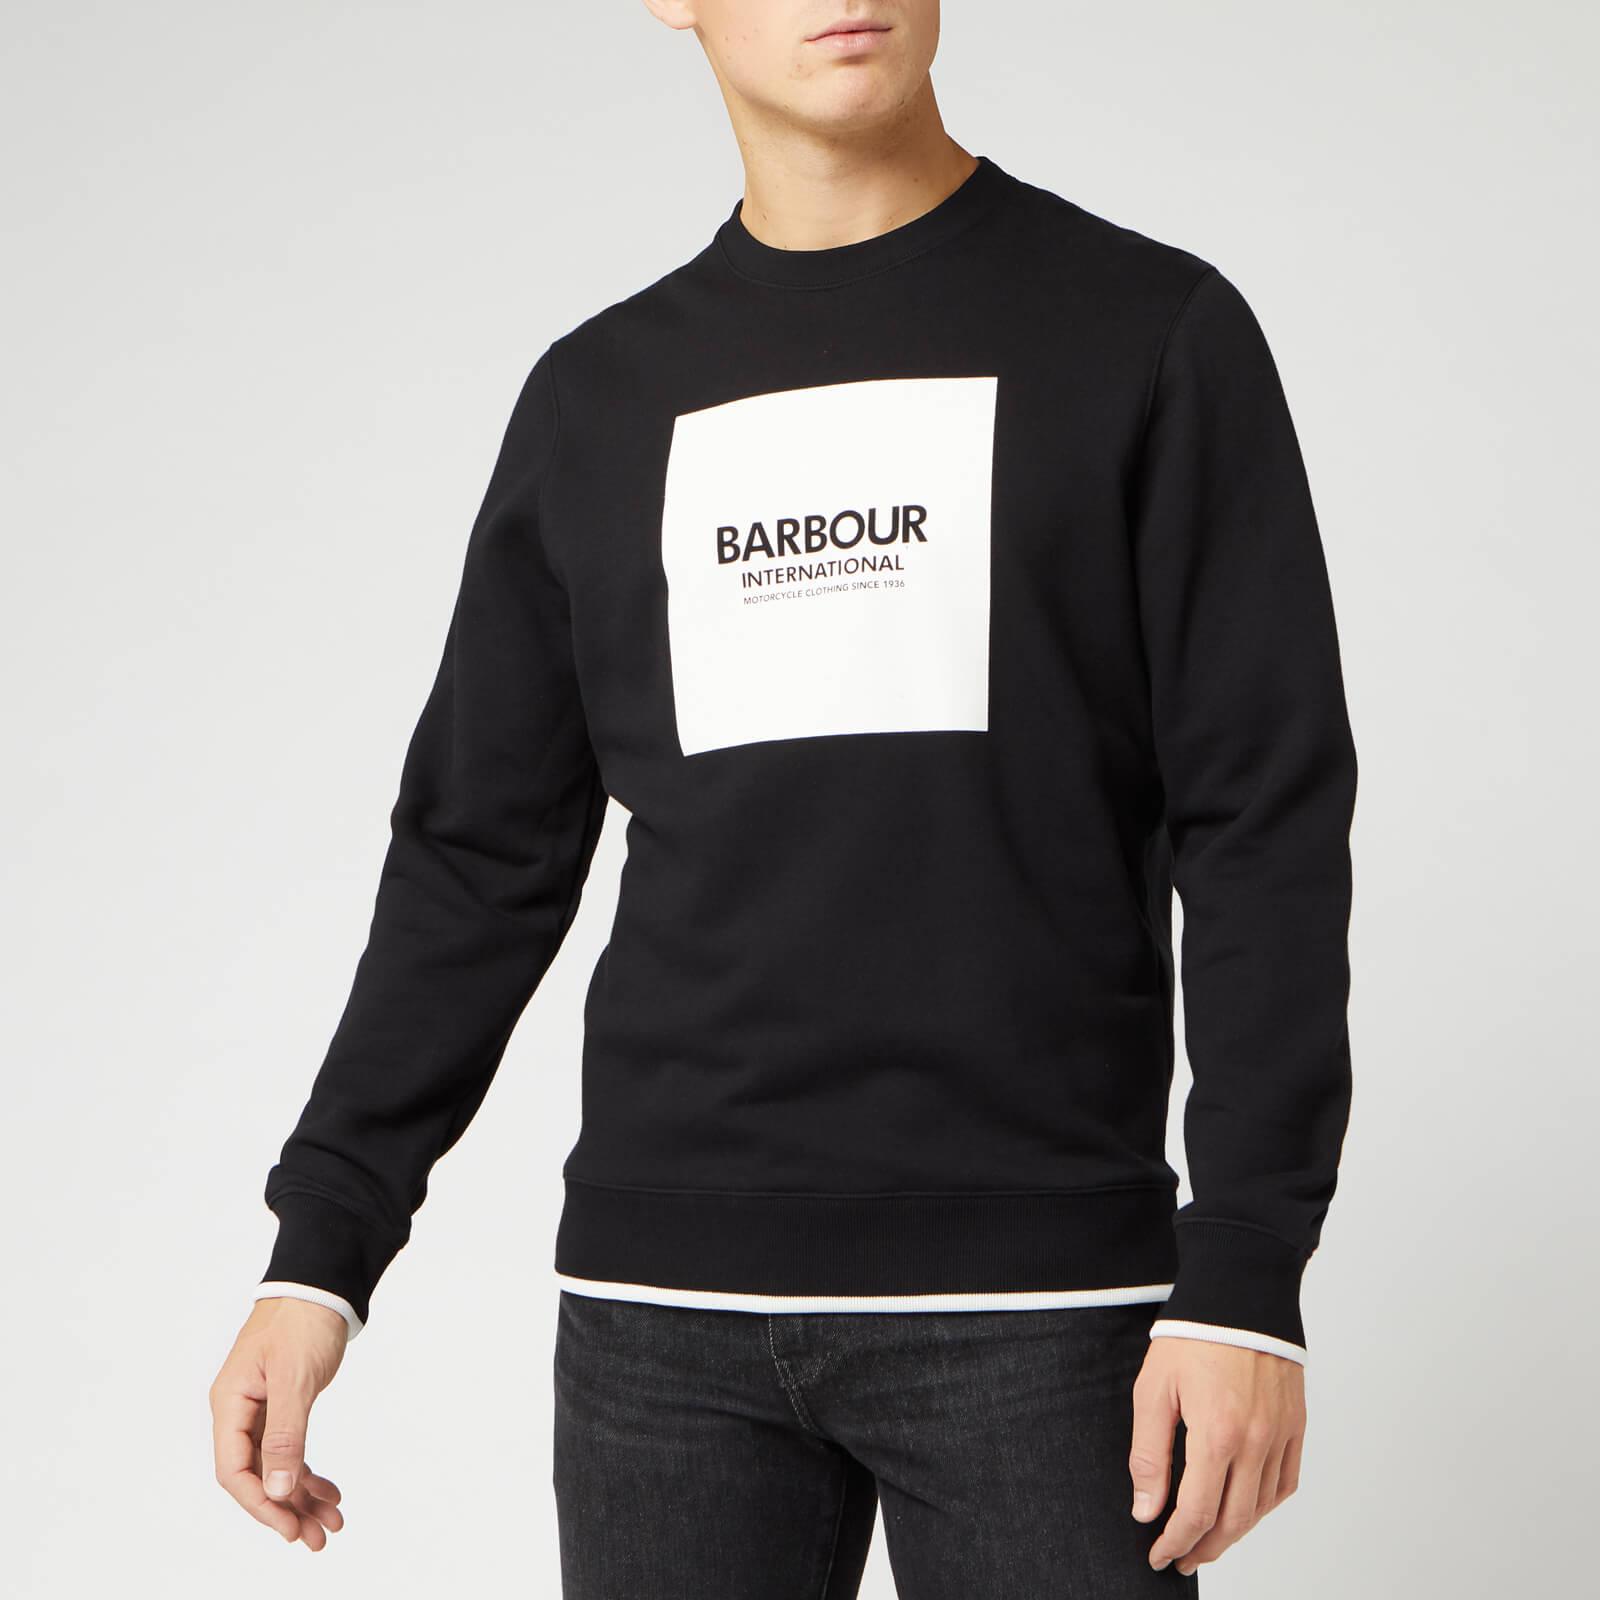 The Hut - Barbour International Crew Sweatshirt - Large - £23